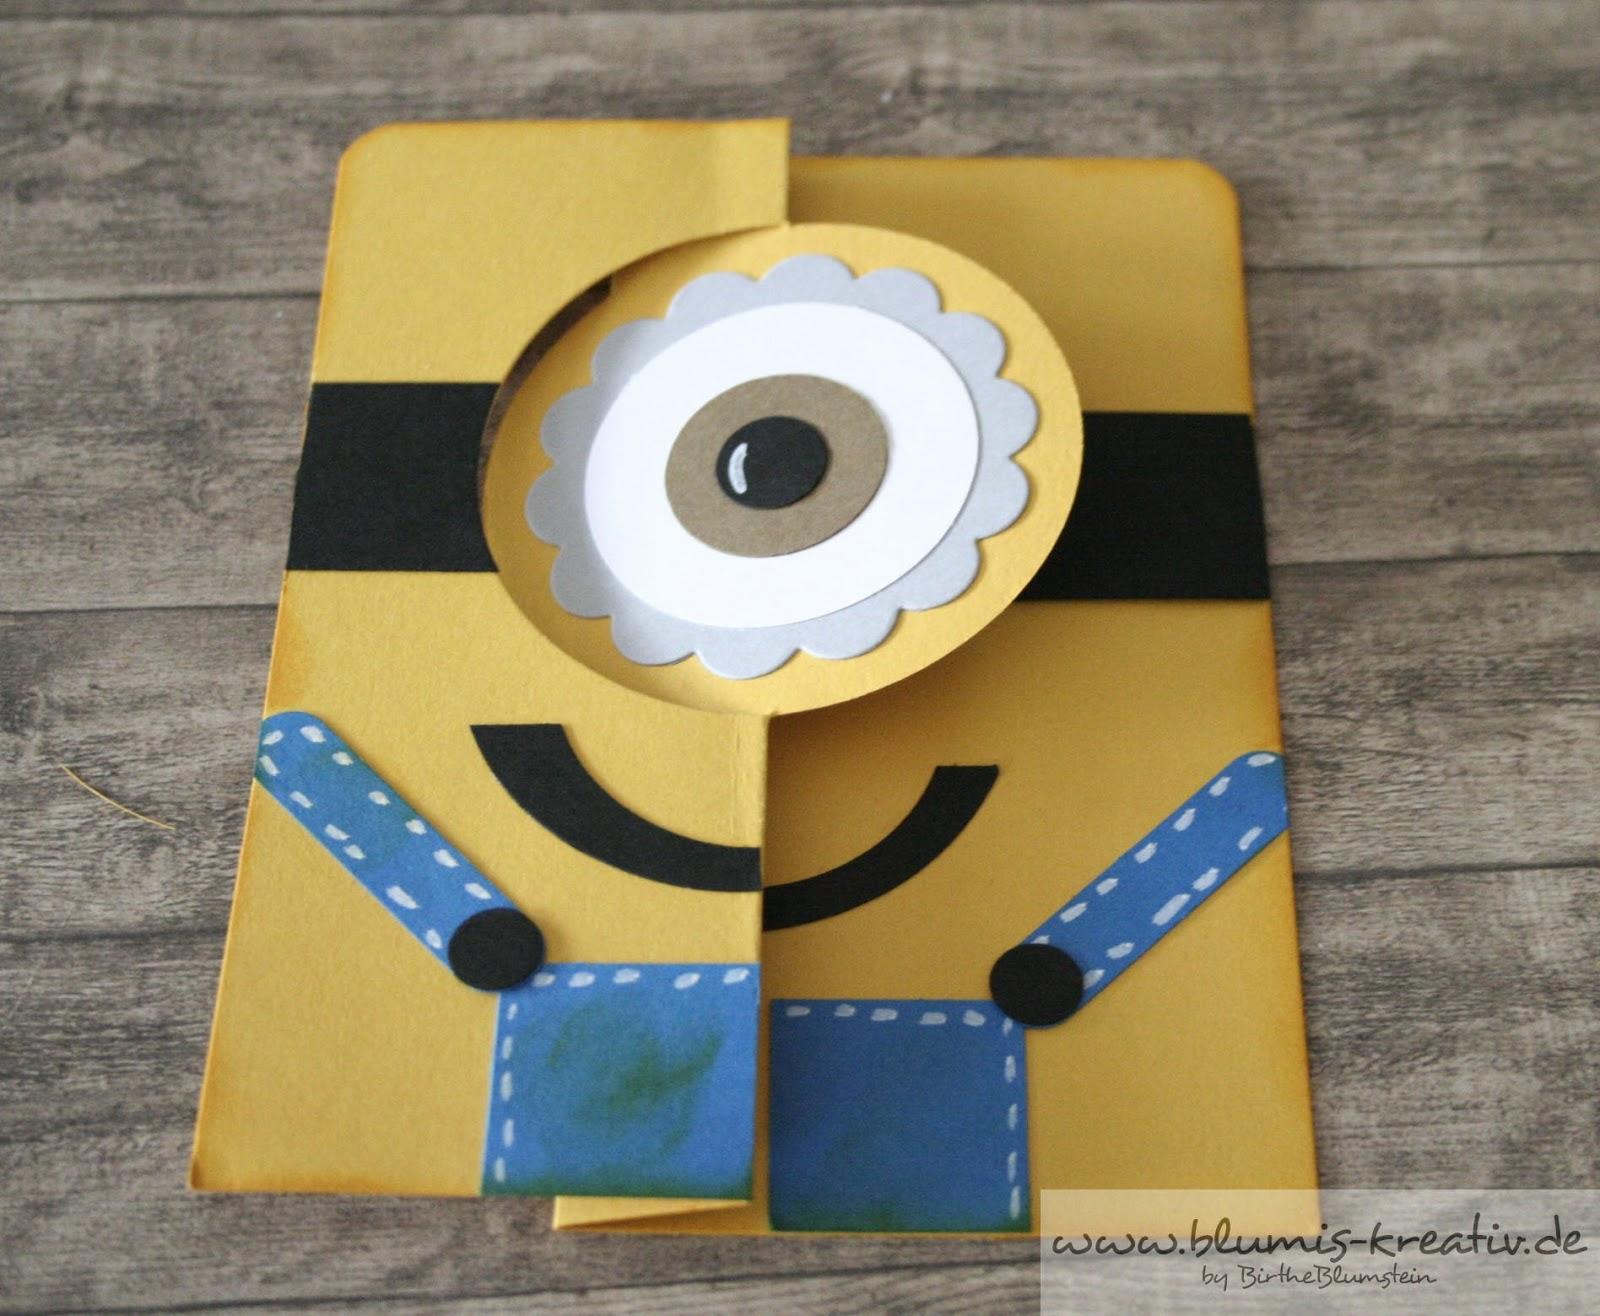 blumis kreativ blog minion flip karte. Black Bedroom Furniture Sets. Home Design Ideas